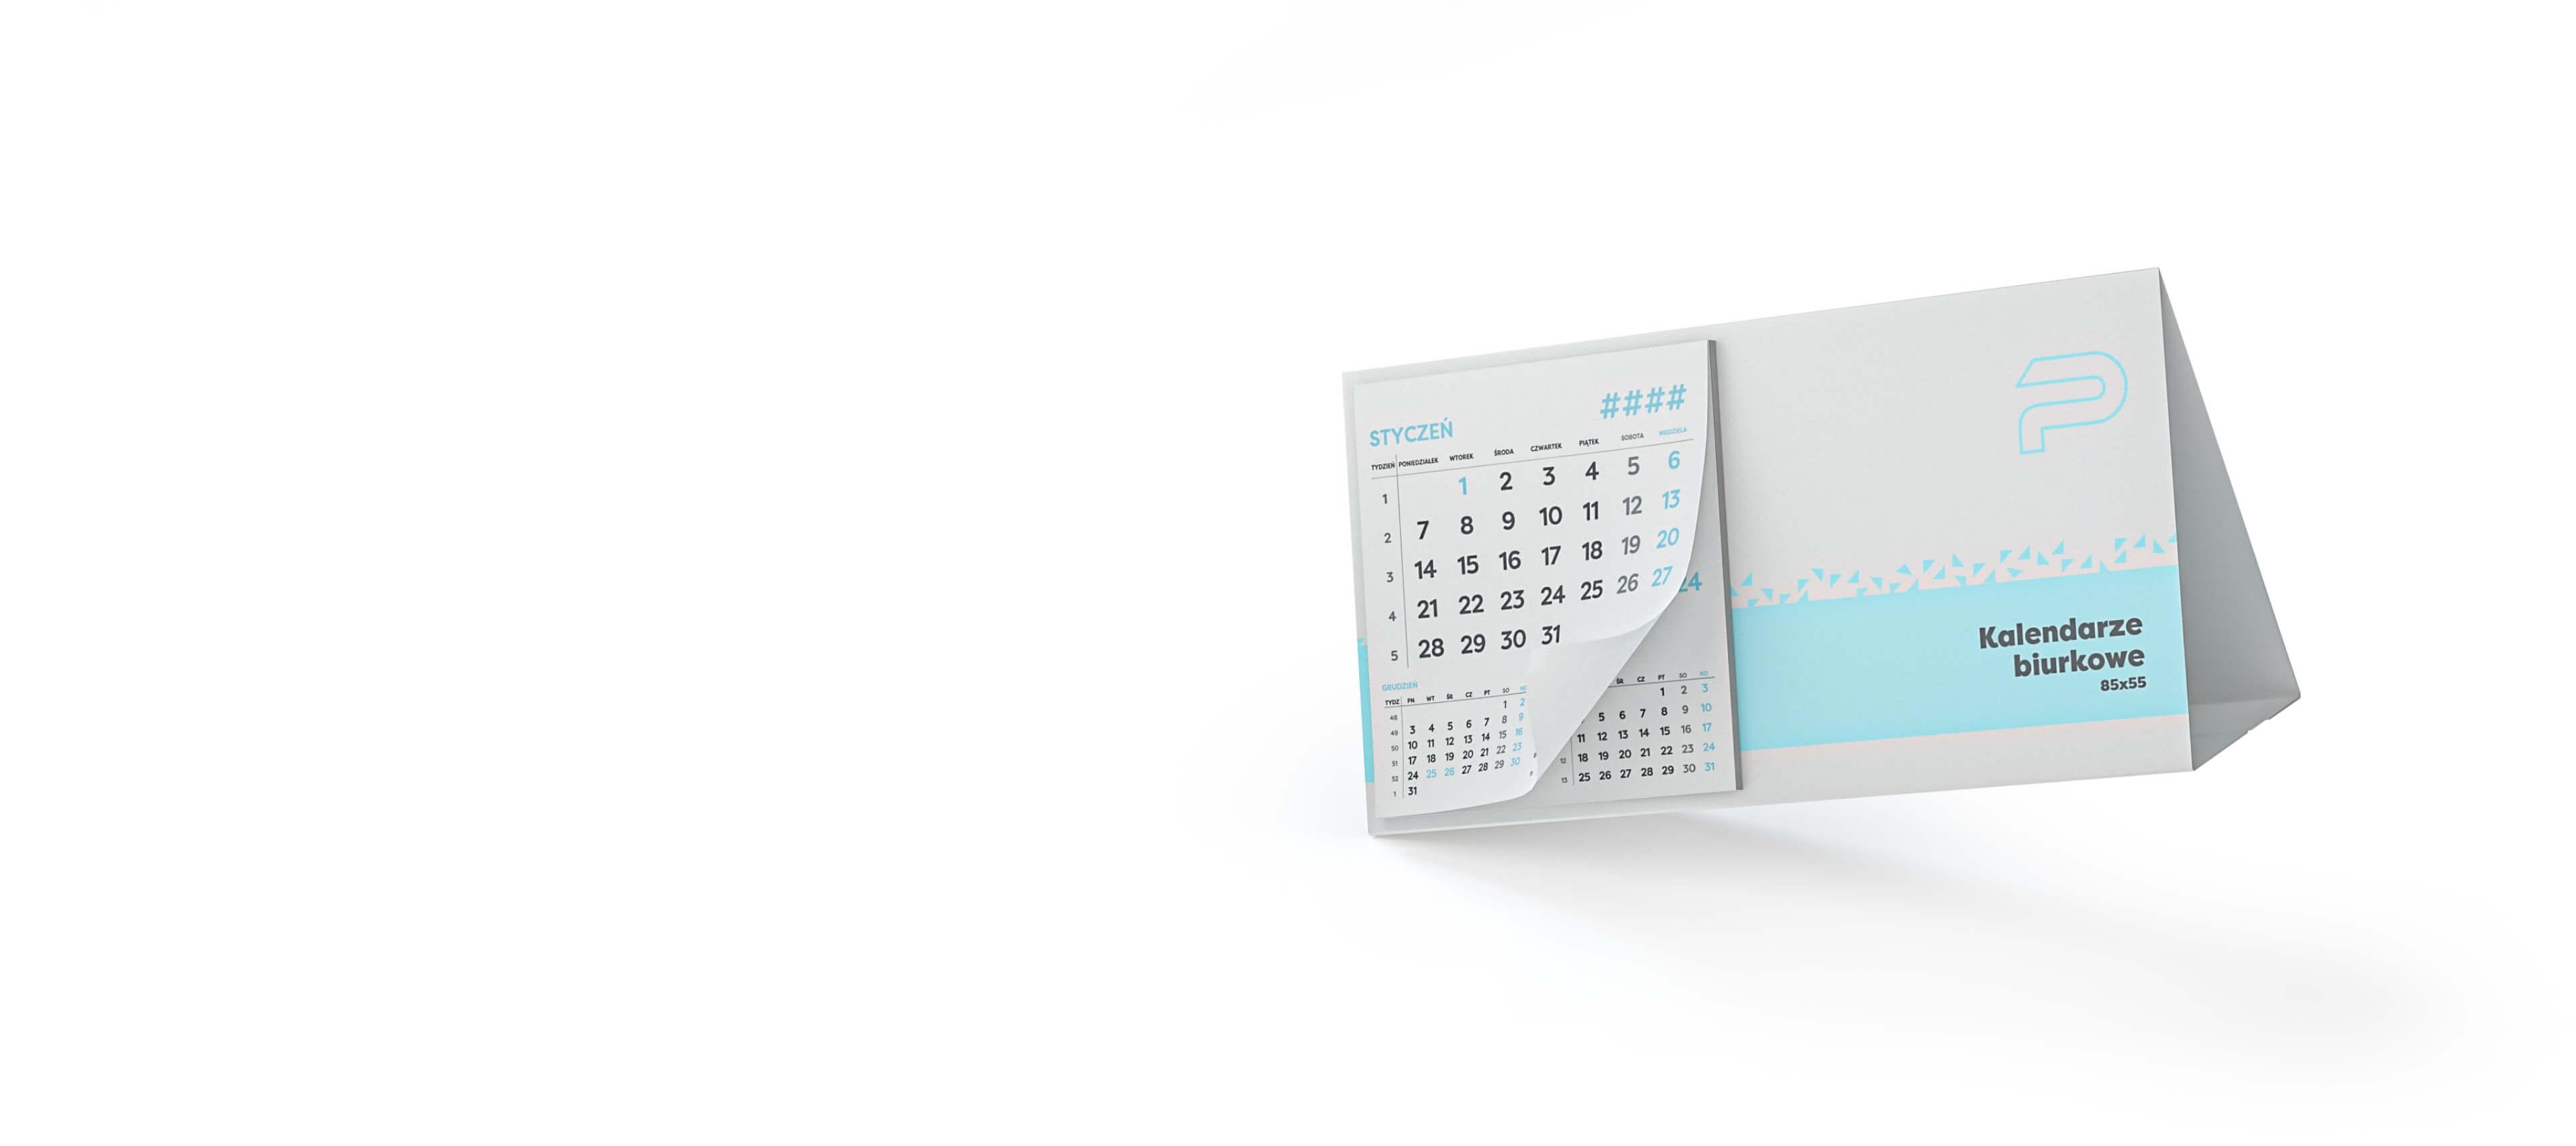 Agencja reklamy, Prestige, Kalendarze, Kalendarz, Kalendarze reklamowe, Kalendarze z logo